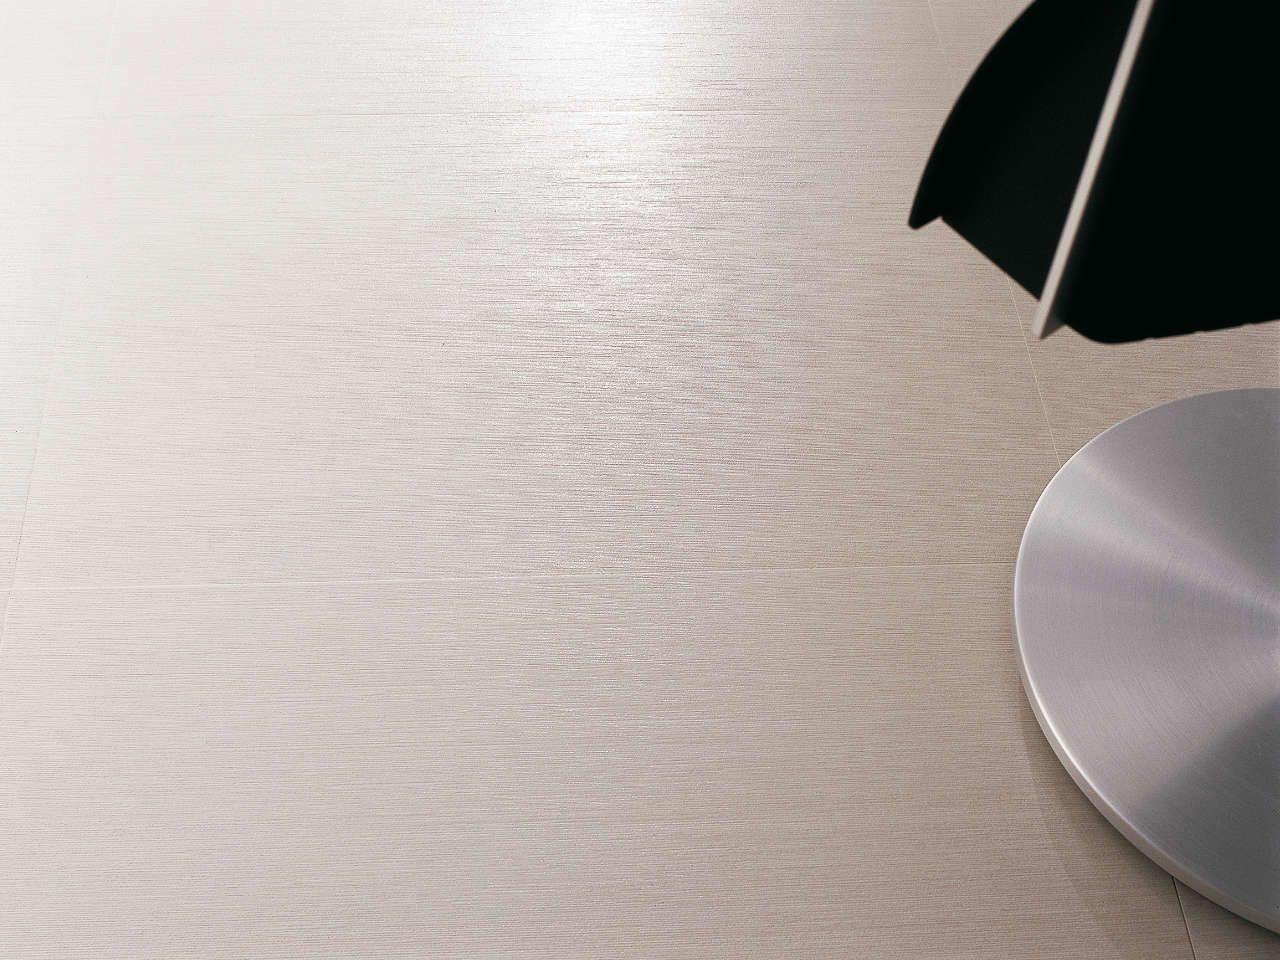 Pavimenti In Gres Porcellanato Ston Ker Silk Blanco 44x66 Cm Tile Floor Bathroom Floor Tiles Porcelain Tile